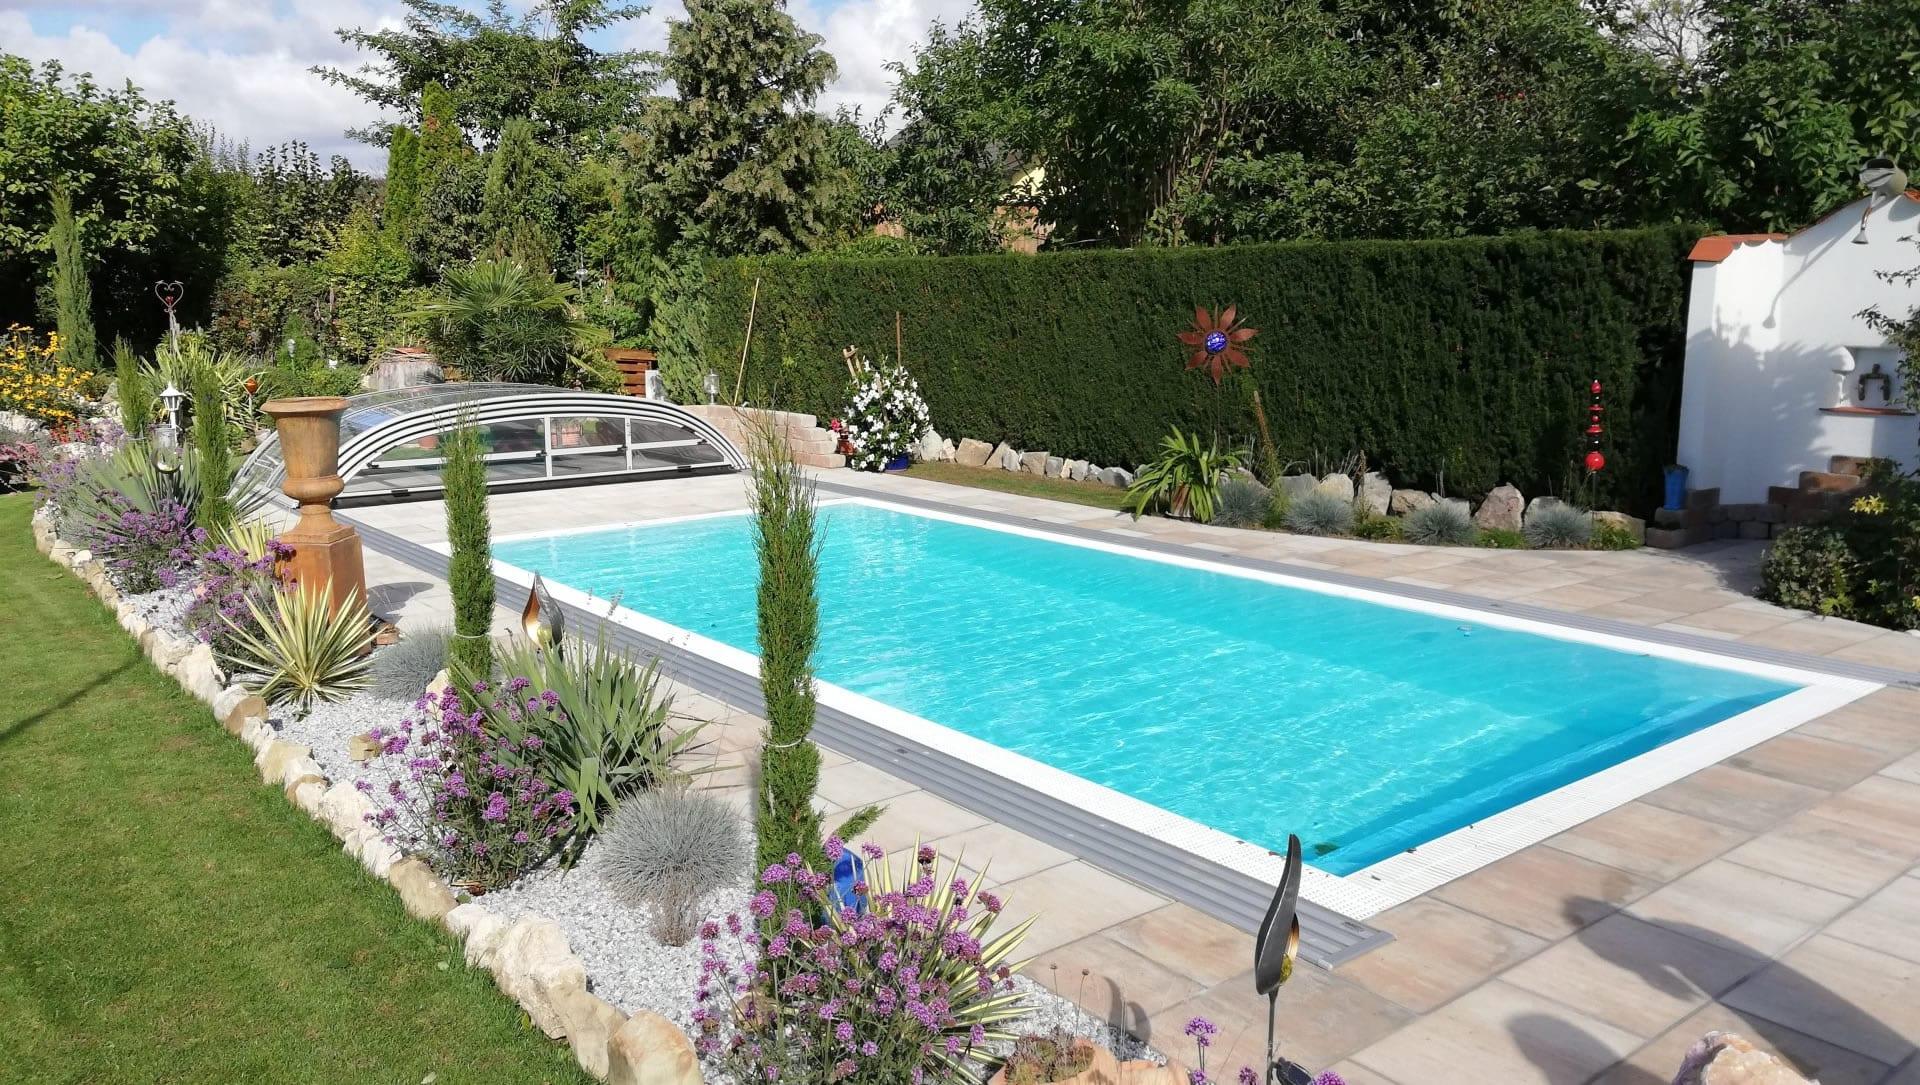 Pool & Swimmingpool